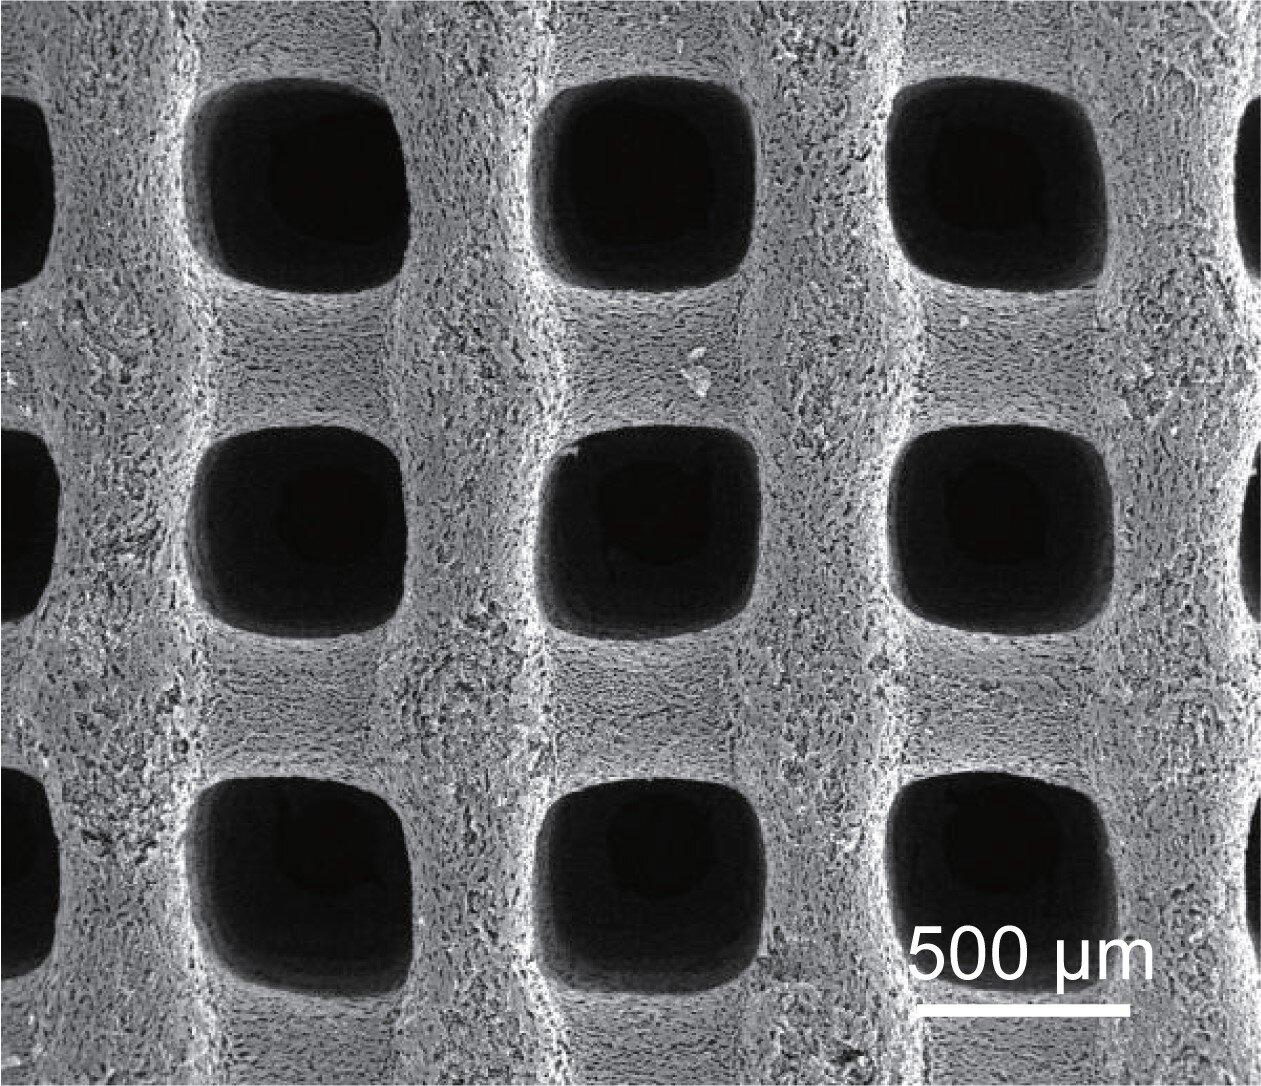 Porous, ultra-low-temperature supercapacitors could power Mars, polar missions